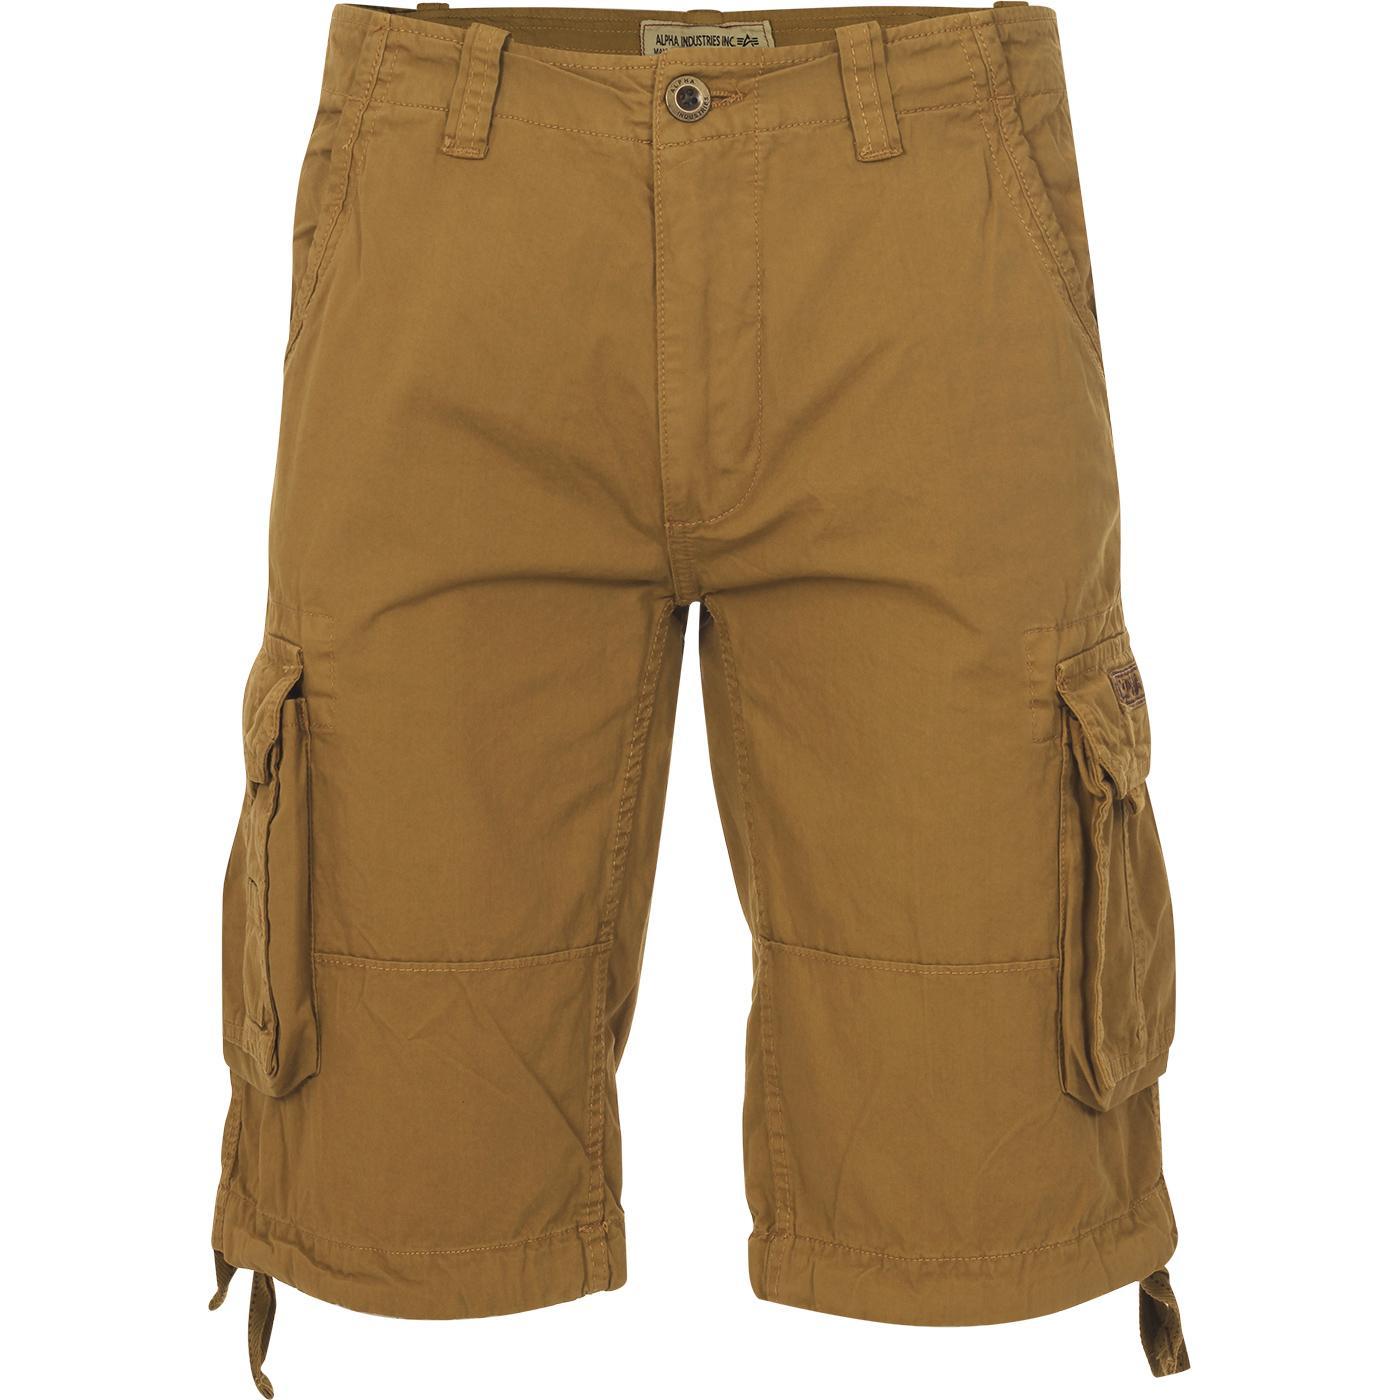 Jet Shorts ALPHA INDUSTRIES Retro Cargo Shorts (K)